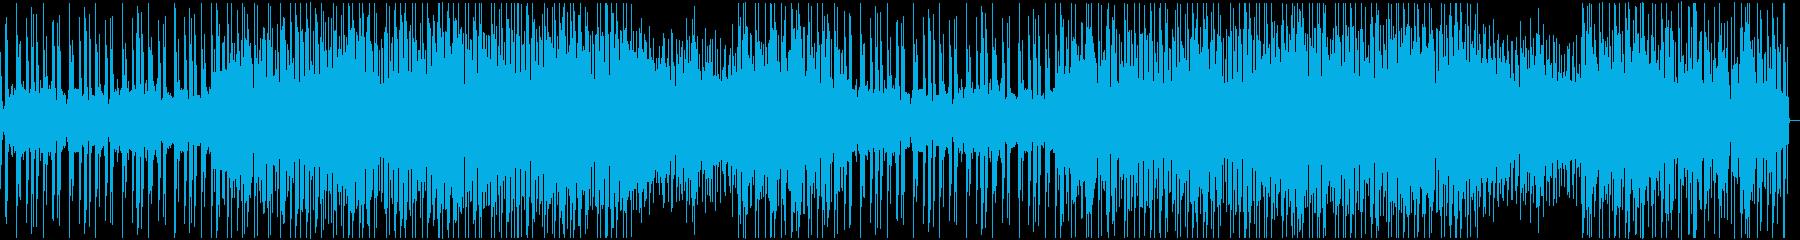 【YouTube】神秘的でクラブっぽい曲の再生済みの波形